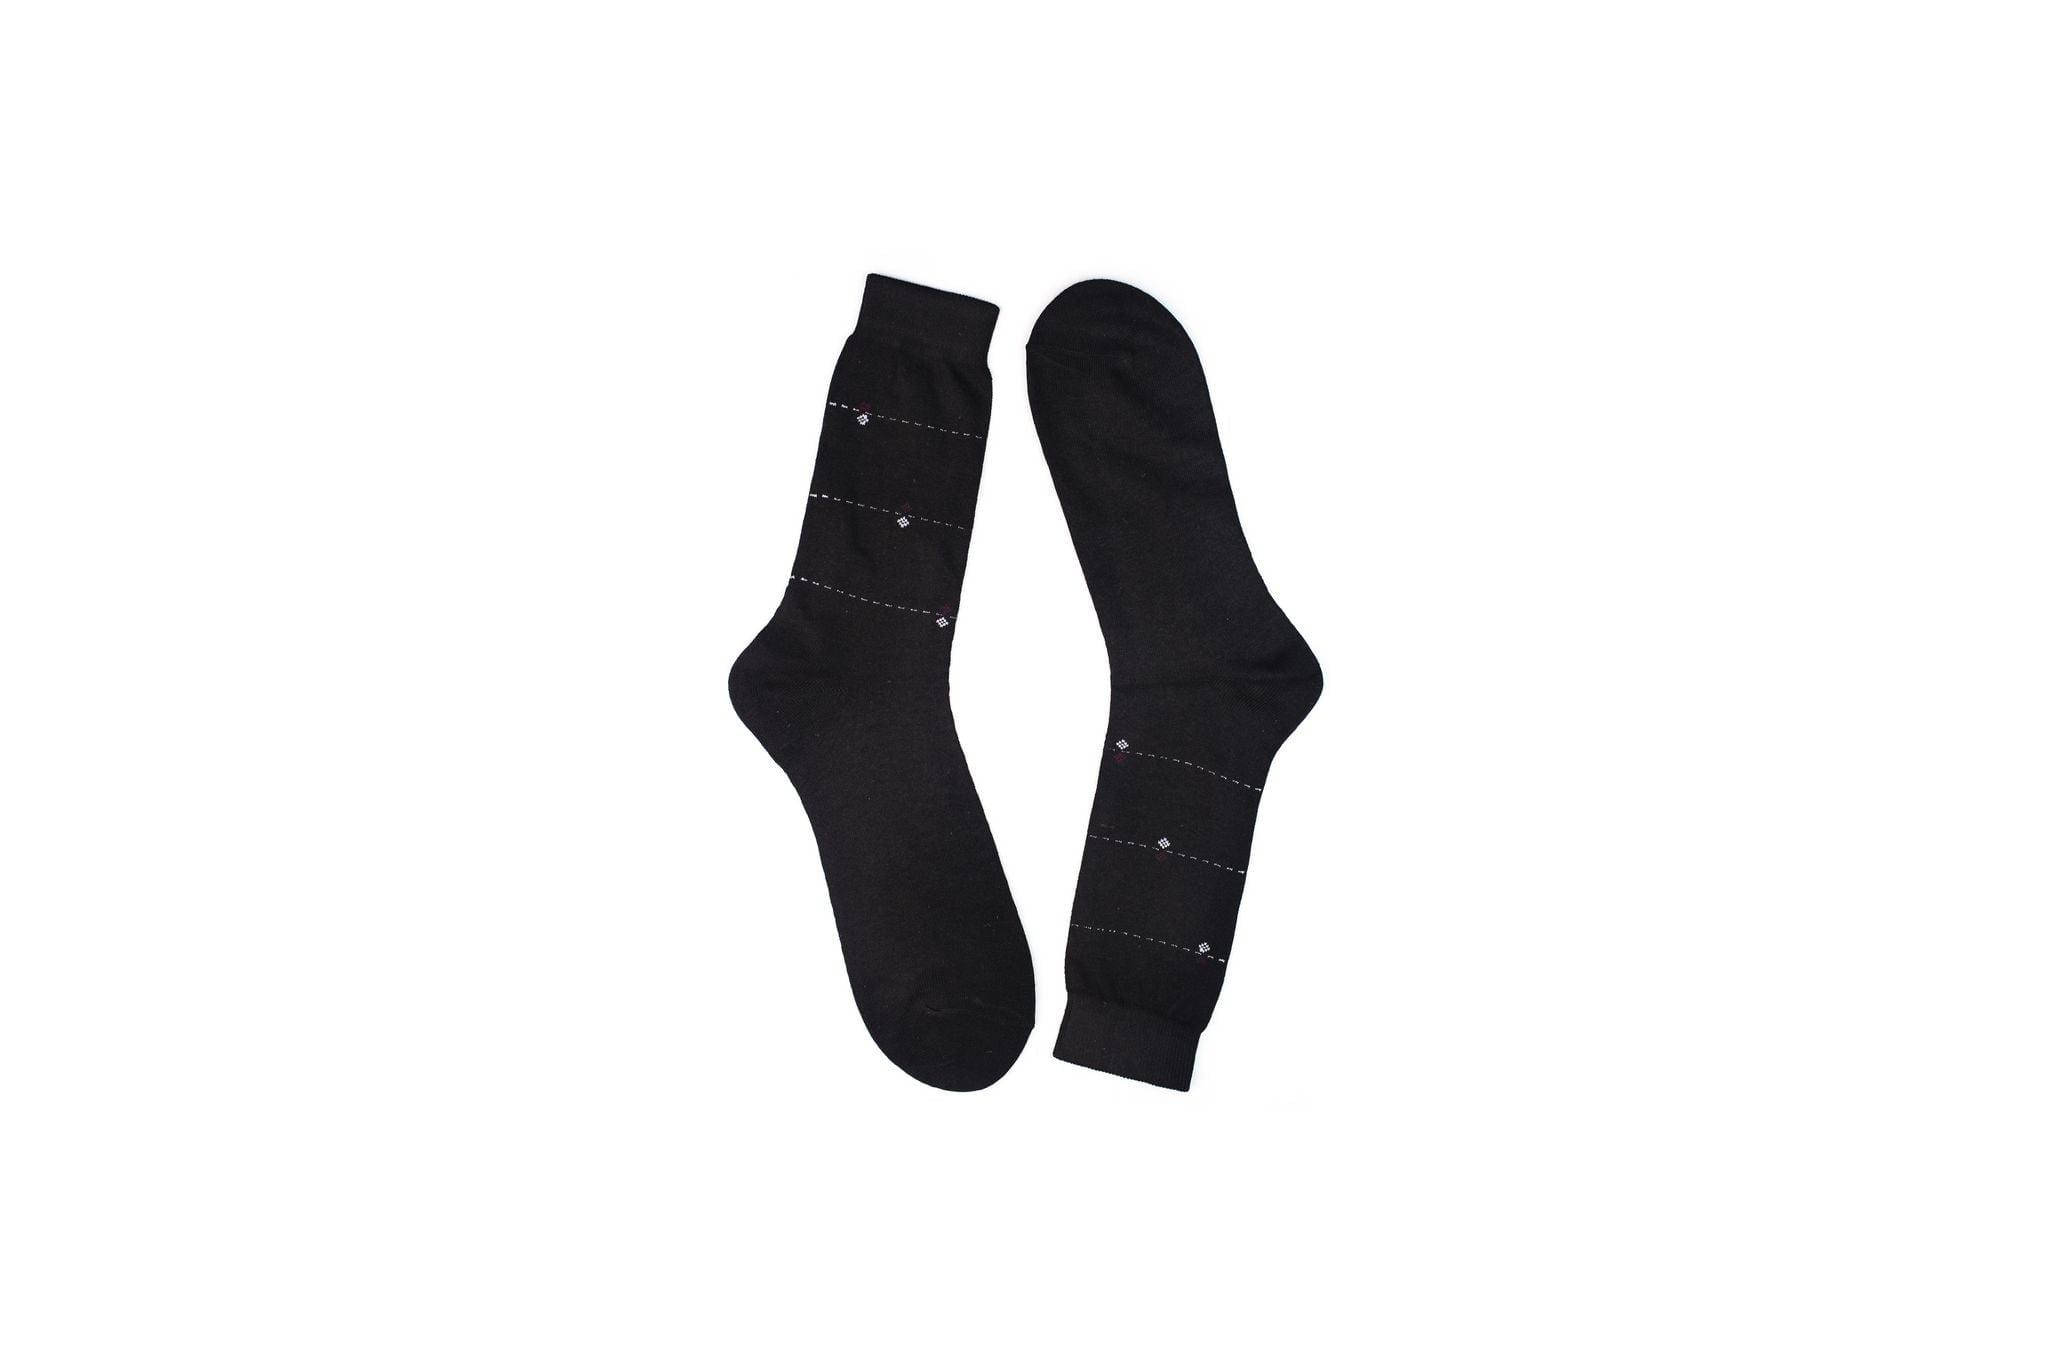 Moody Socks trial 1-455